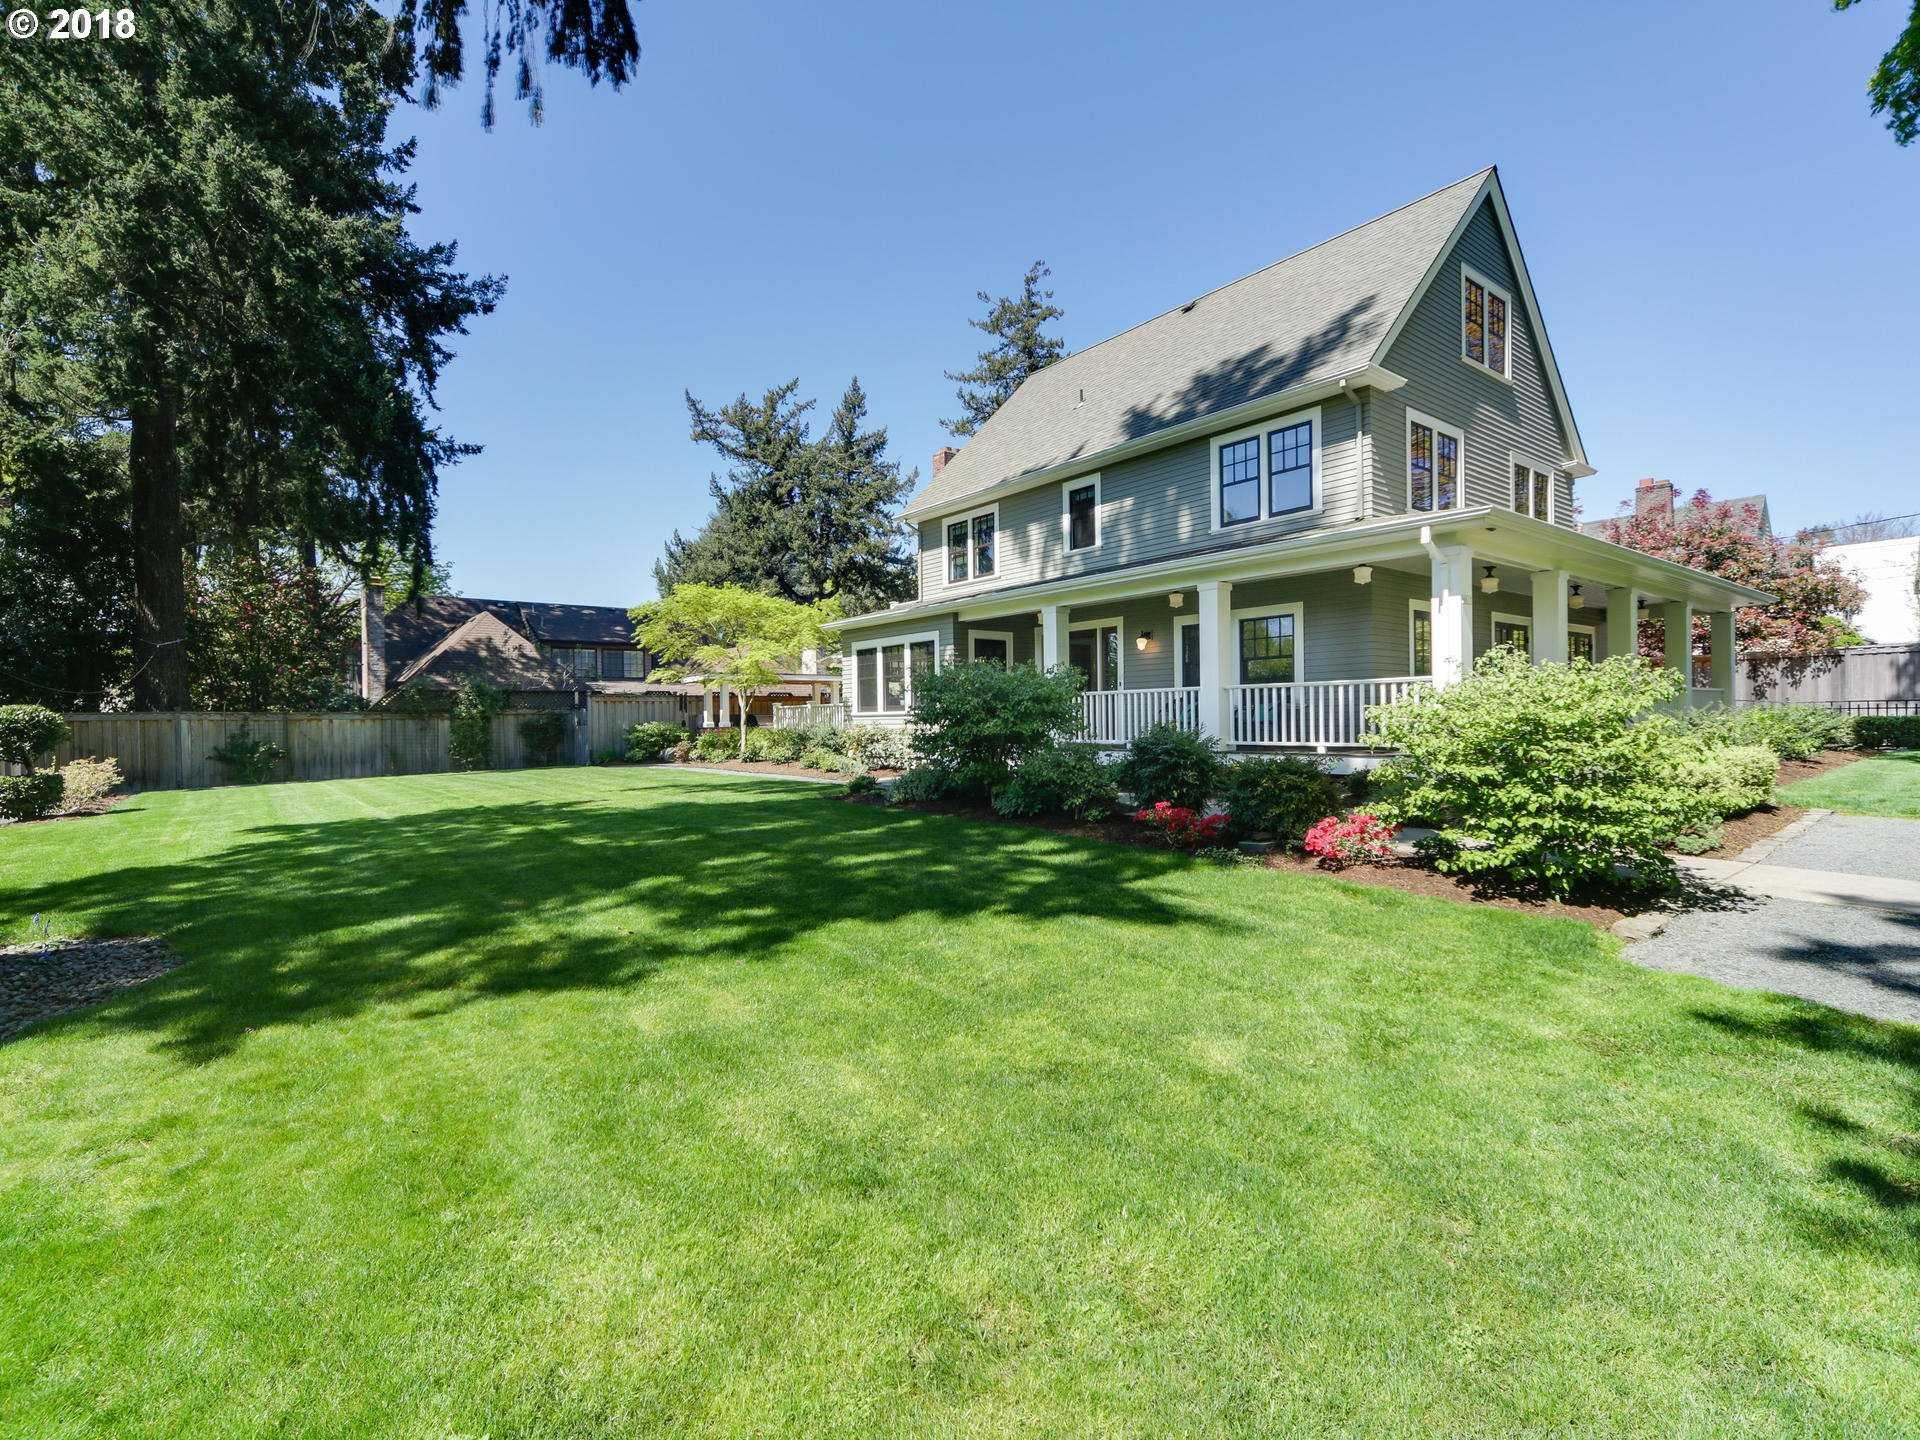 $1,795,000 - 4Br/4Ba -  for Sale in Eastmoreland, Portland